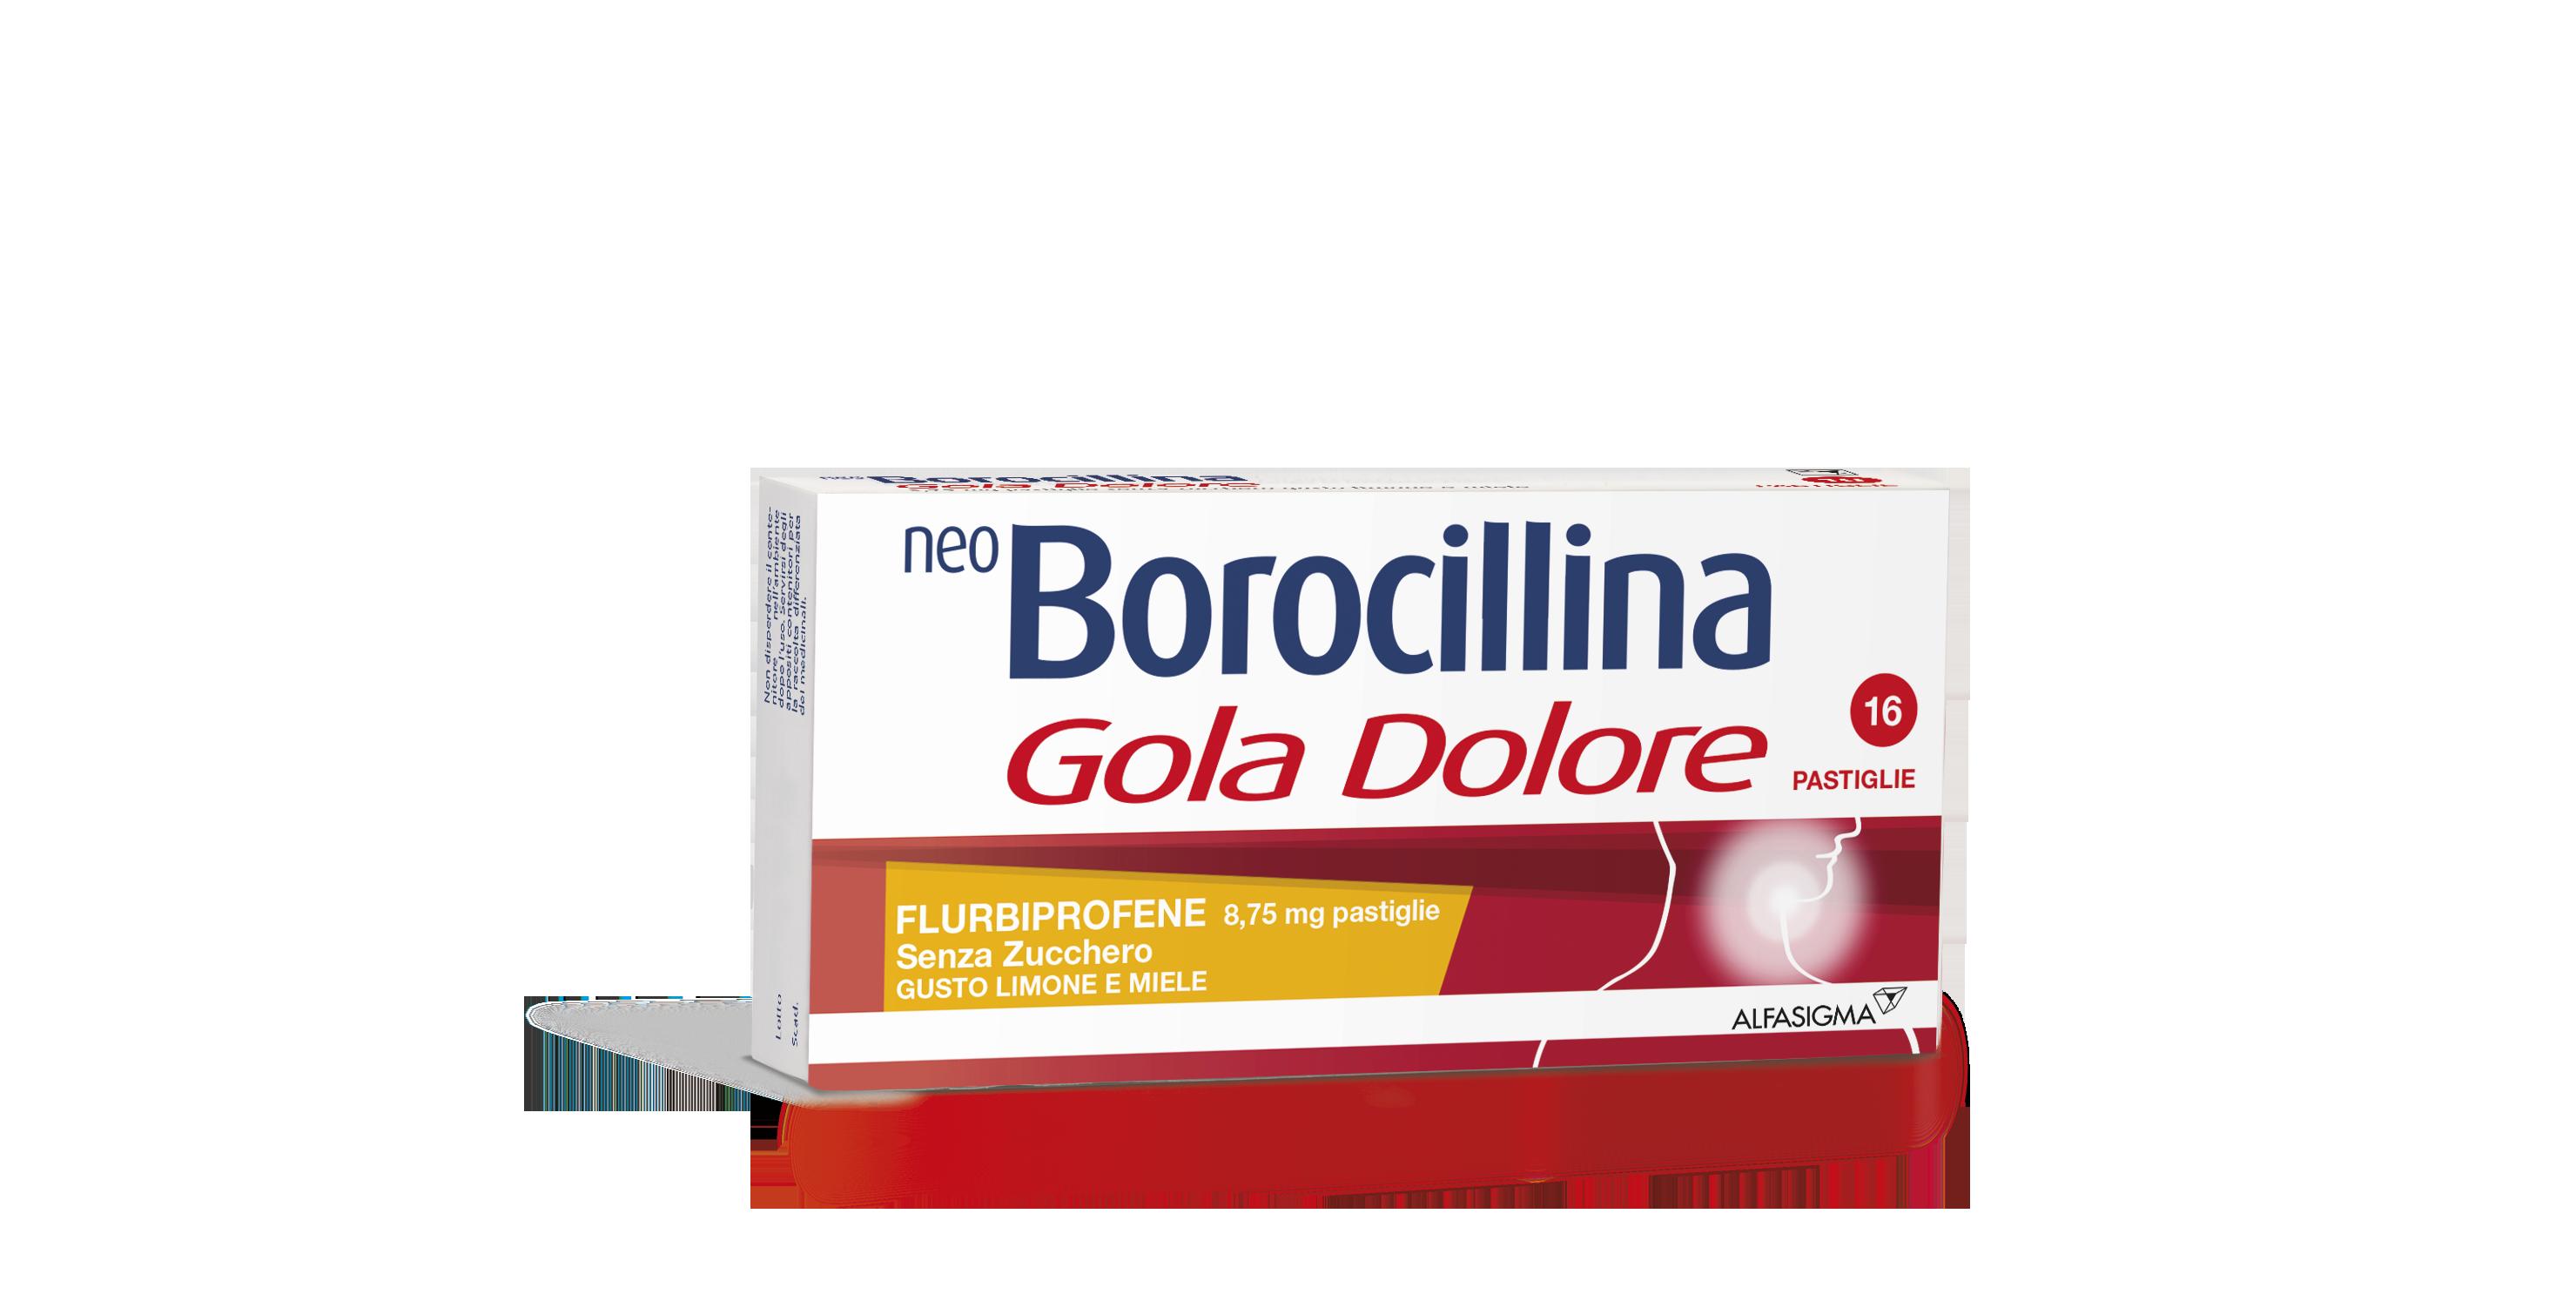 Neoboro Golado 8 75 Mg Pastiglie Senza Zucchero Gusto Limone E Miele 16 Pastiglie